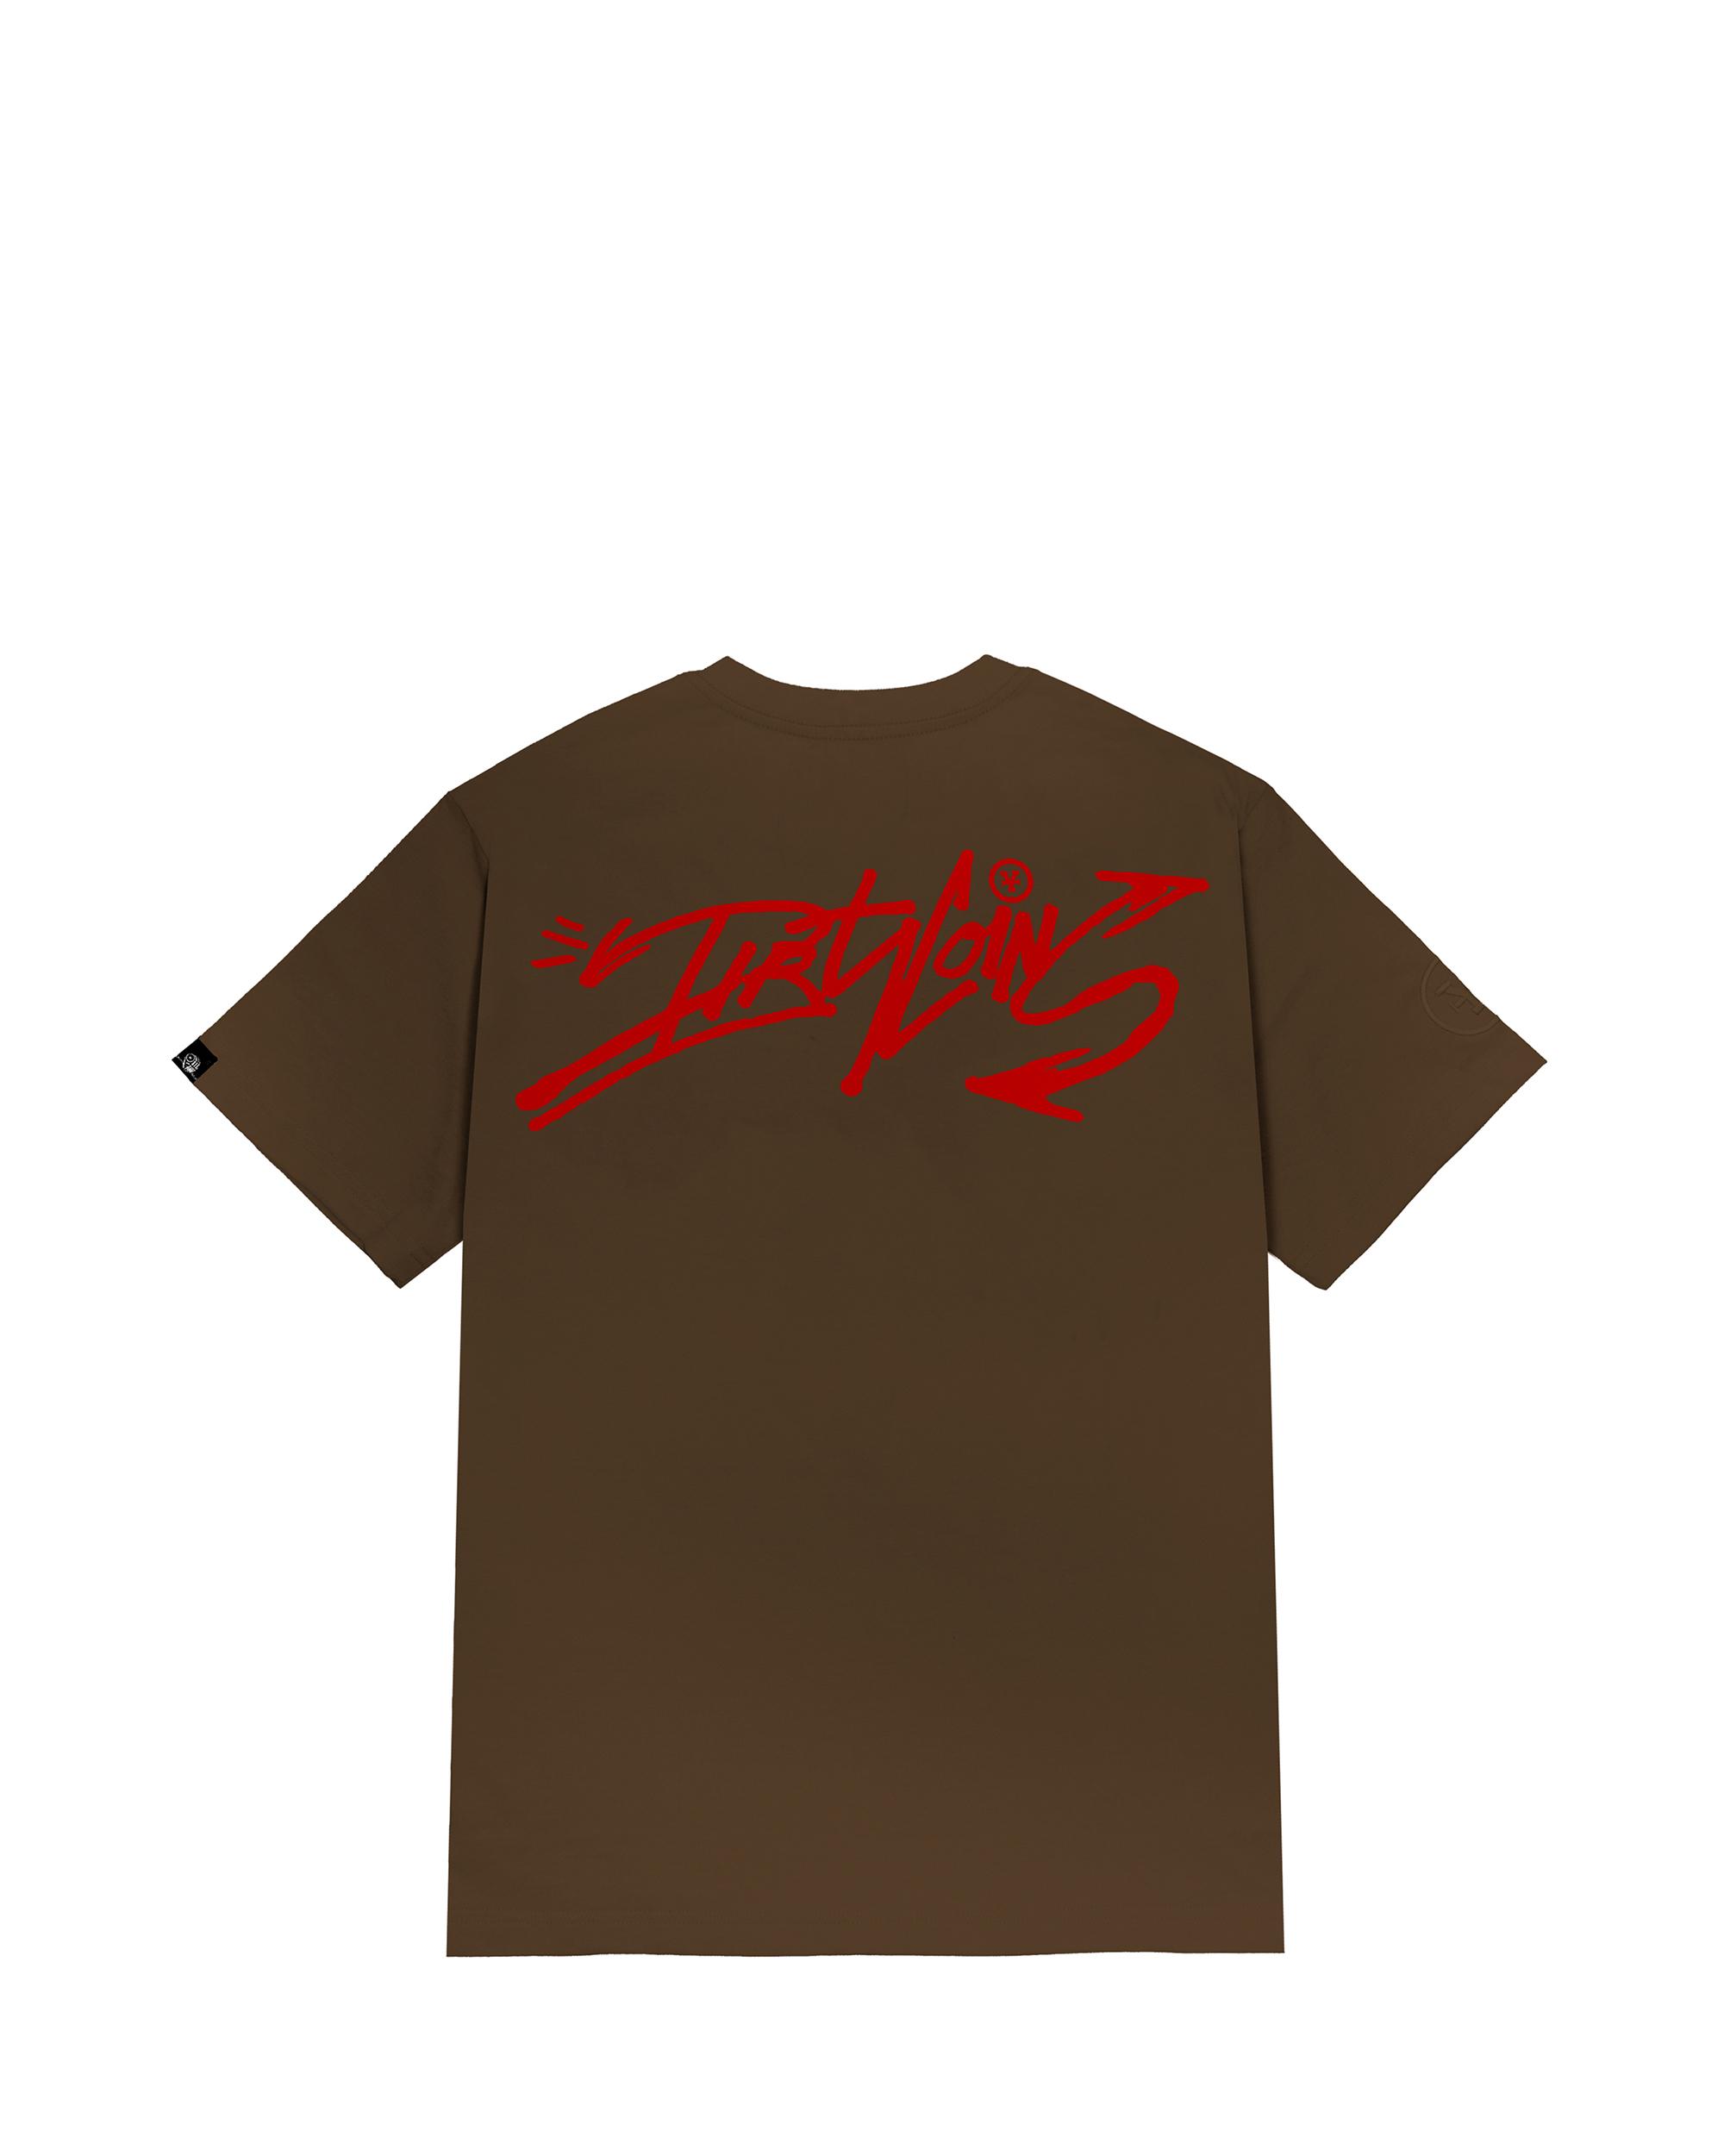 DirtyCoins Graffitee - Brown